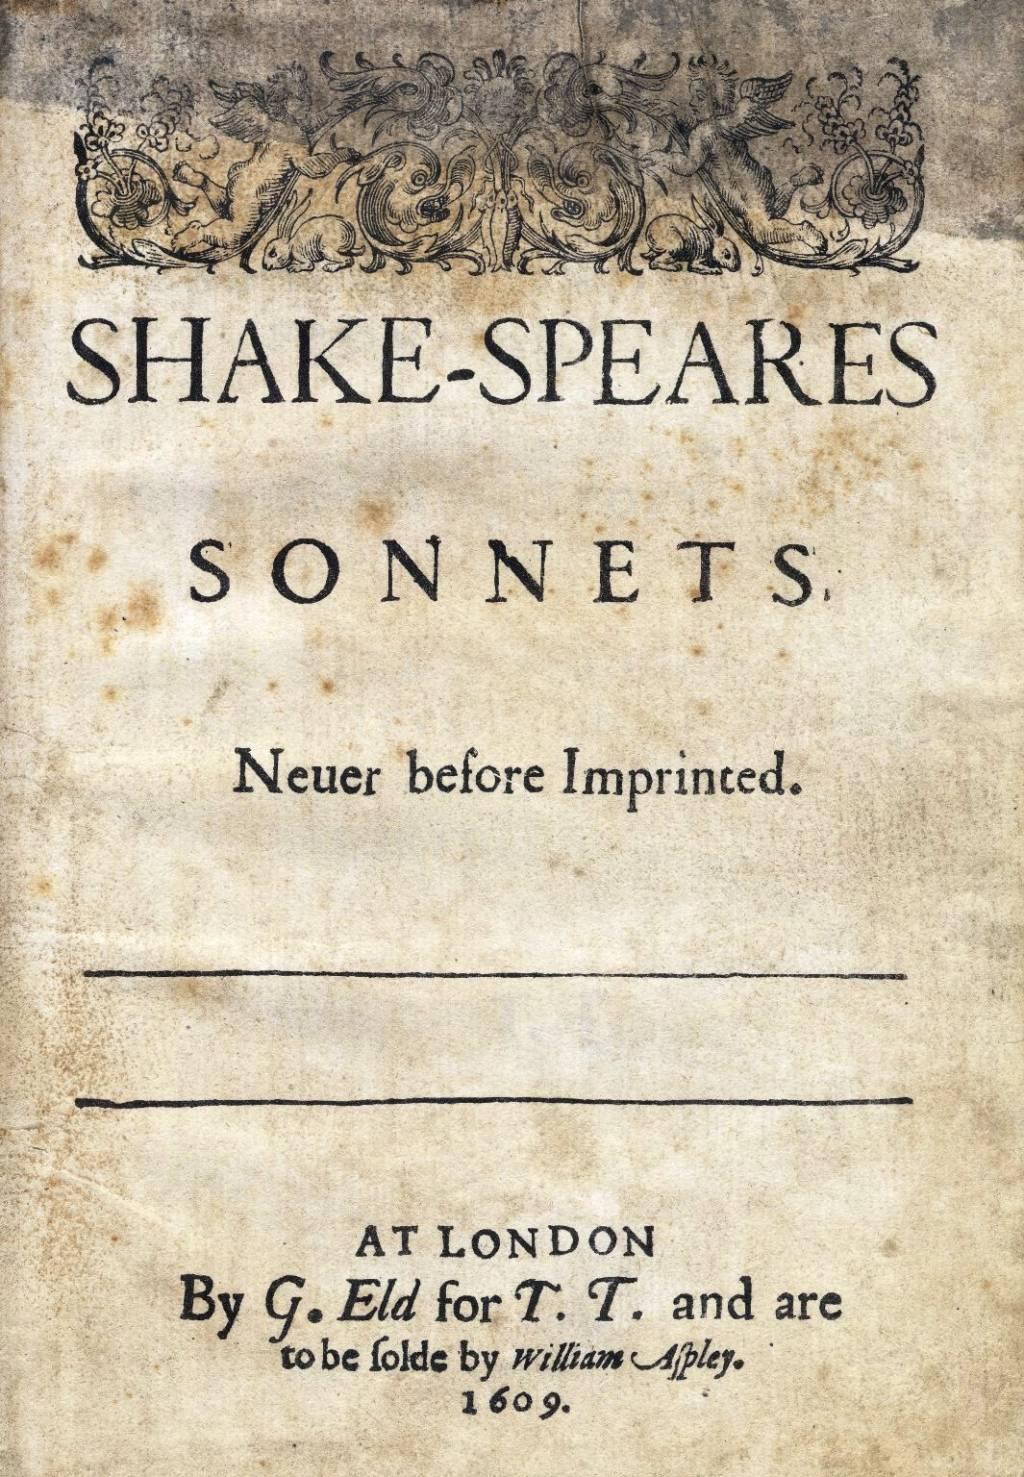 sonnet 130 parody